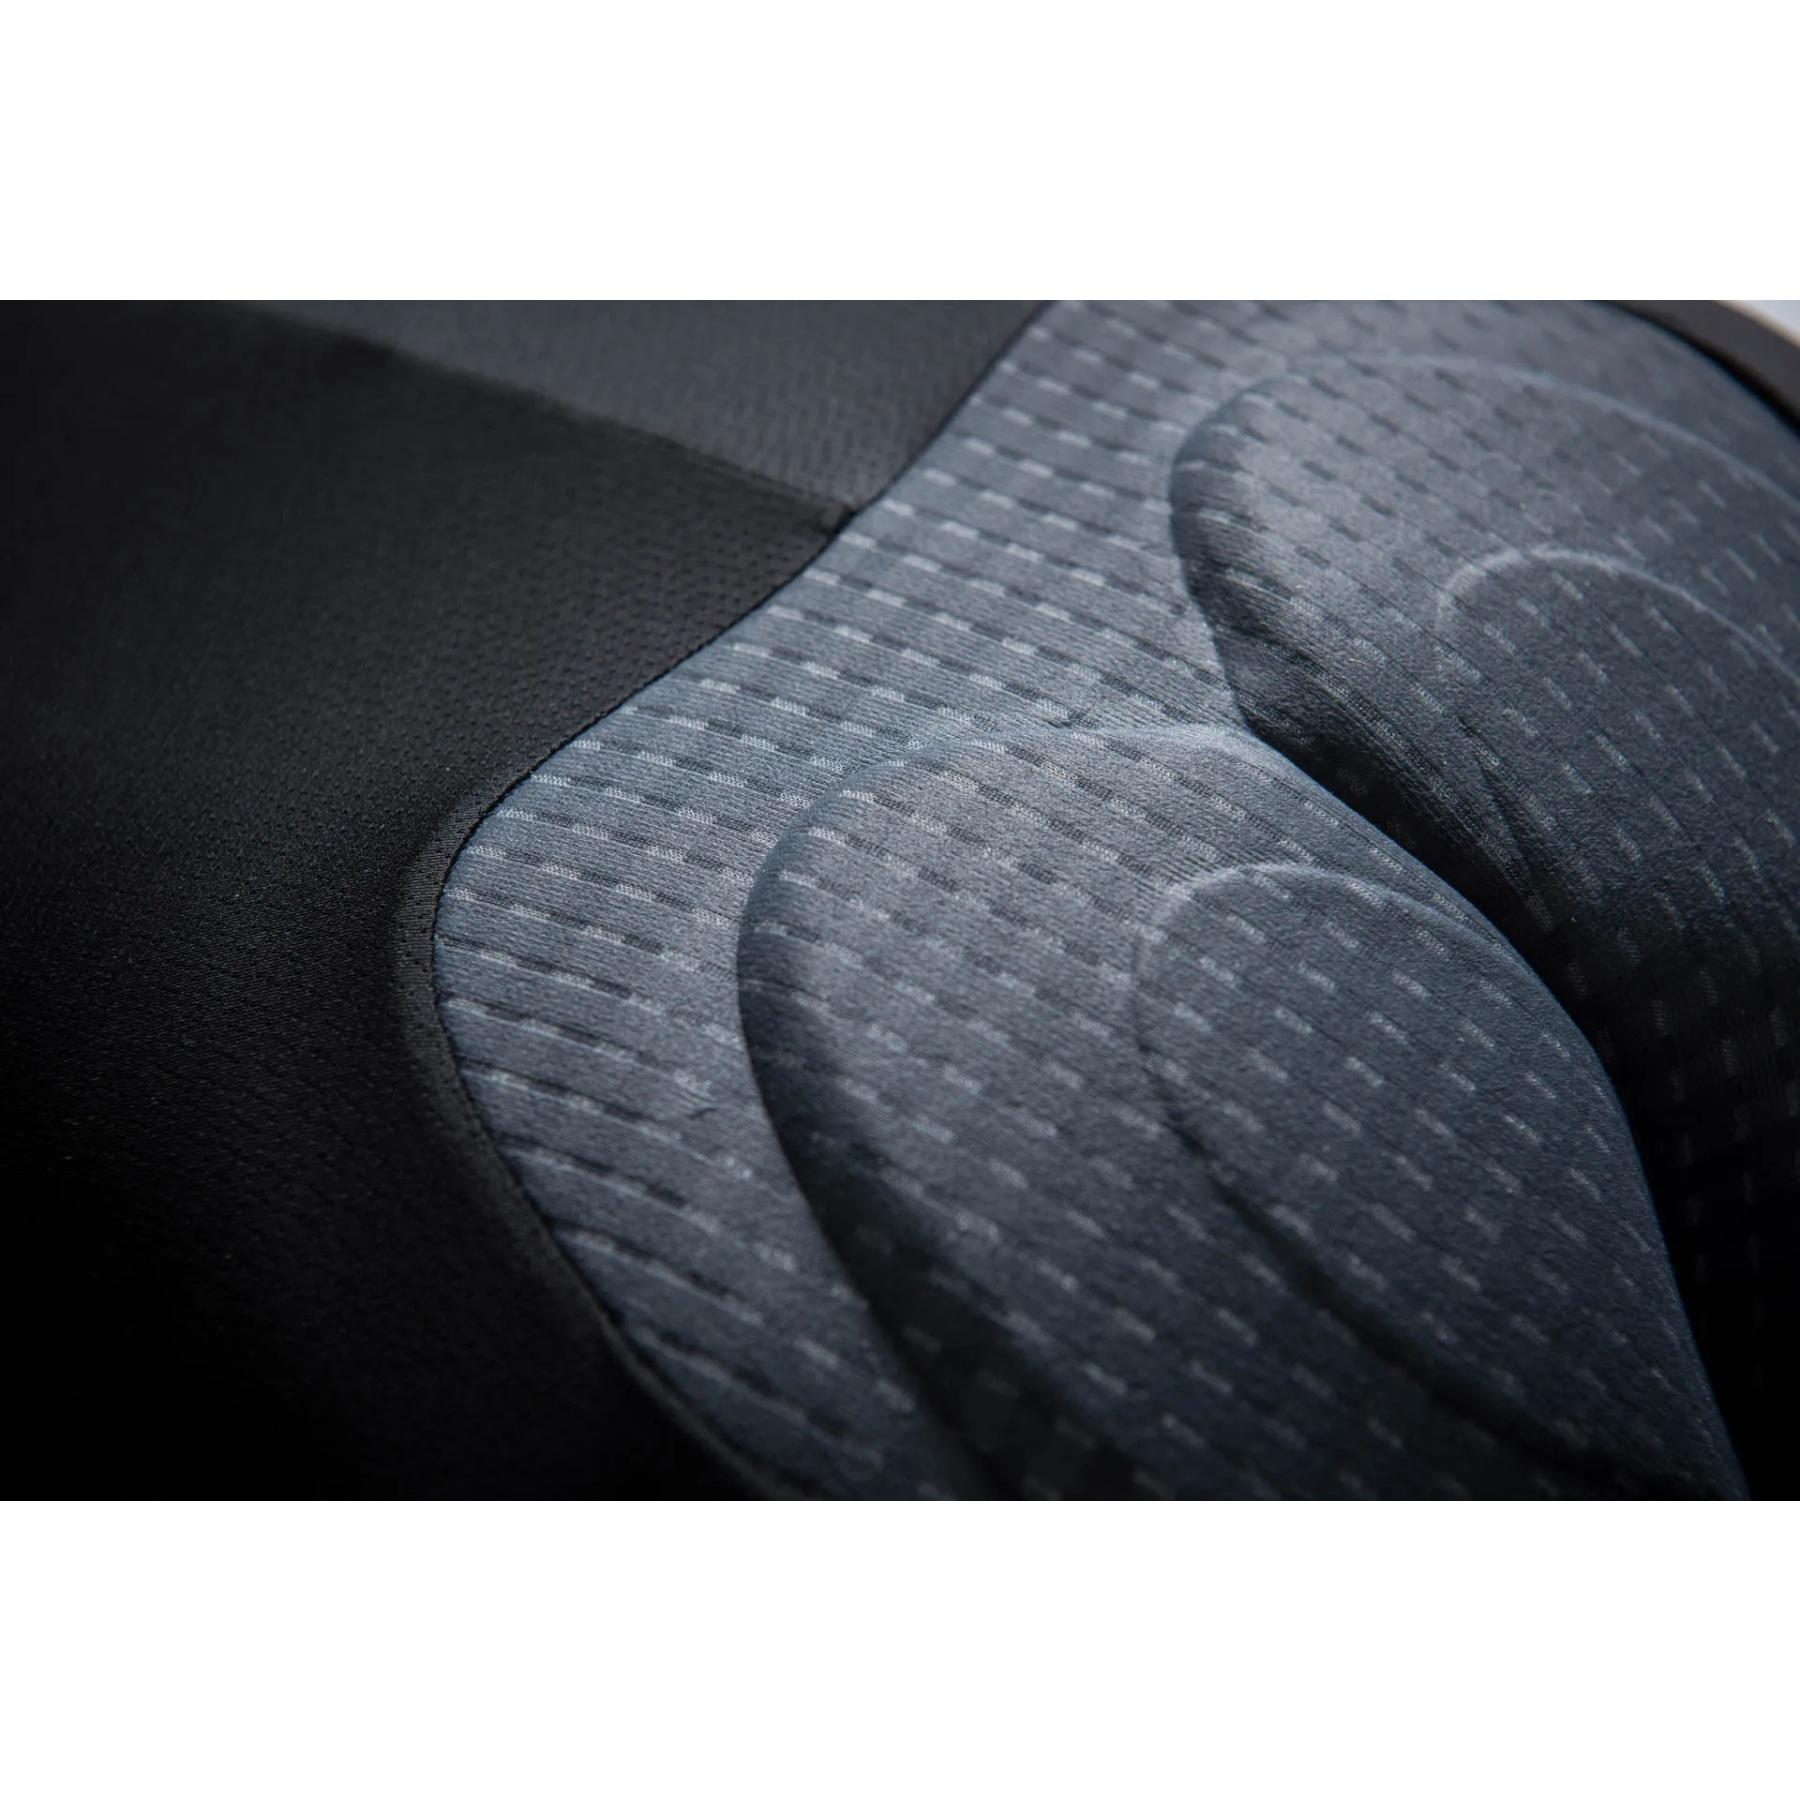 Imagen de 7mesh MK3 Bib Shorts Culotte con tirantes para hombres - Black